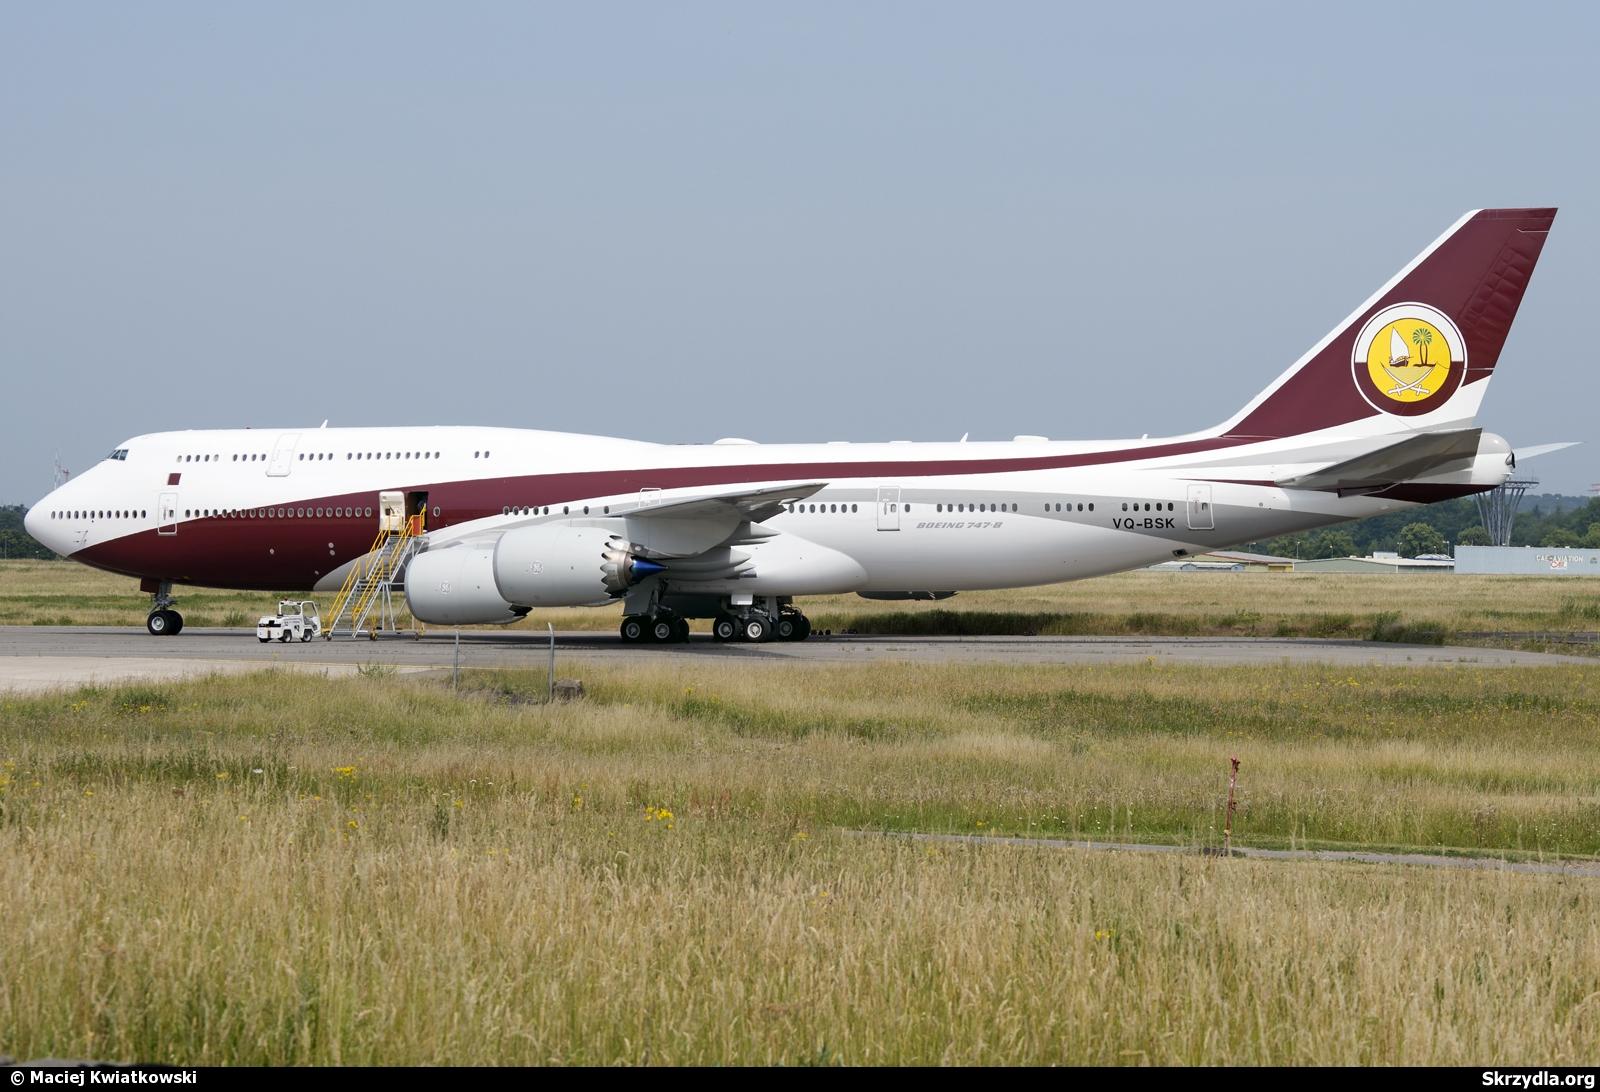 22/06/17 - 747-8 VQ-BSK 369033